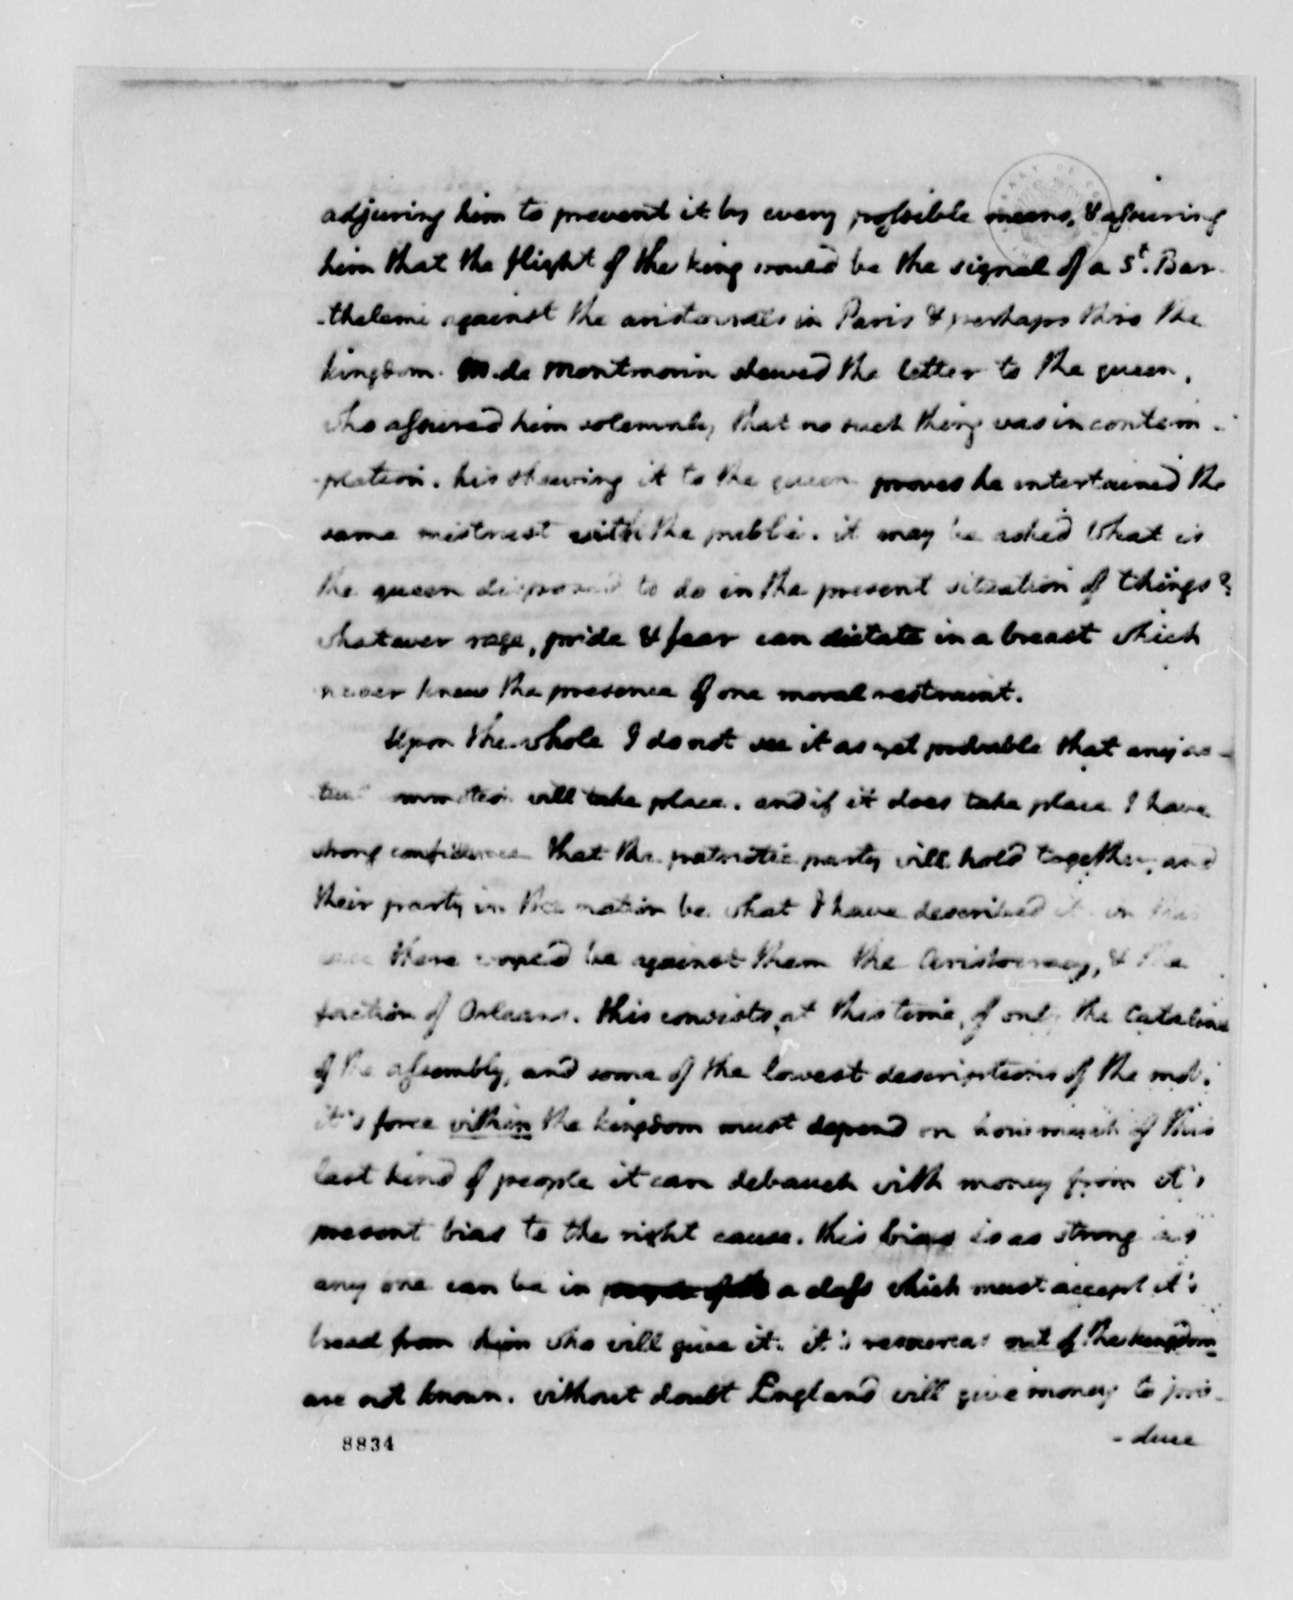 Thomas Jefferson to John Jay, September 19, 1789